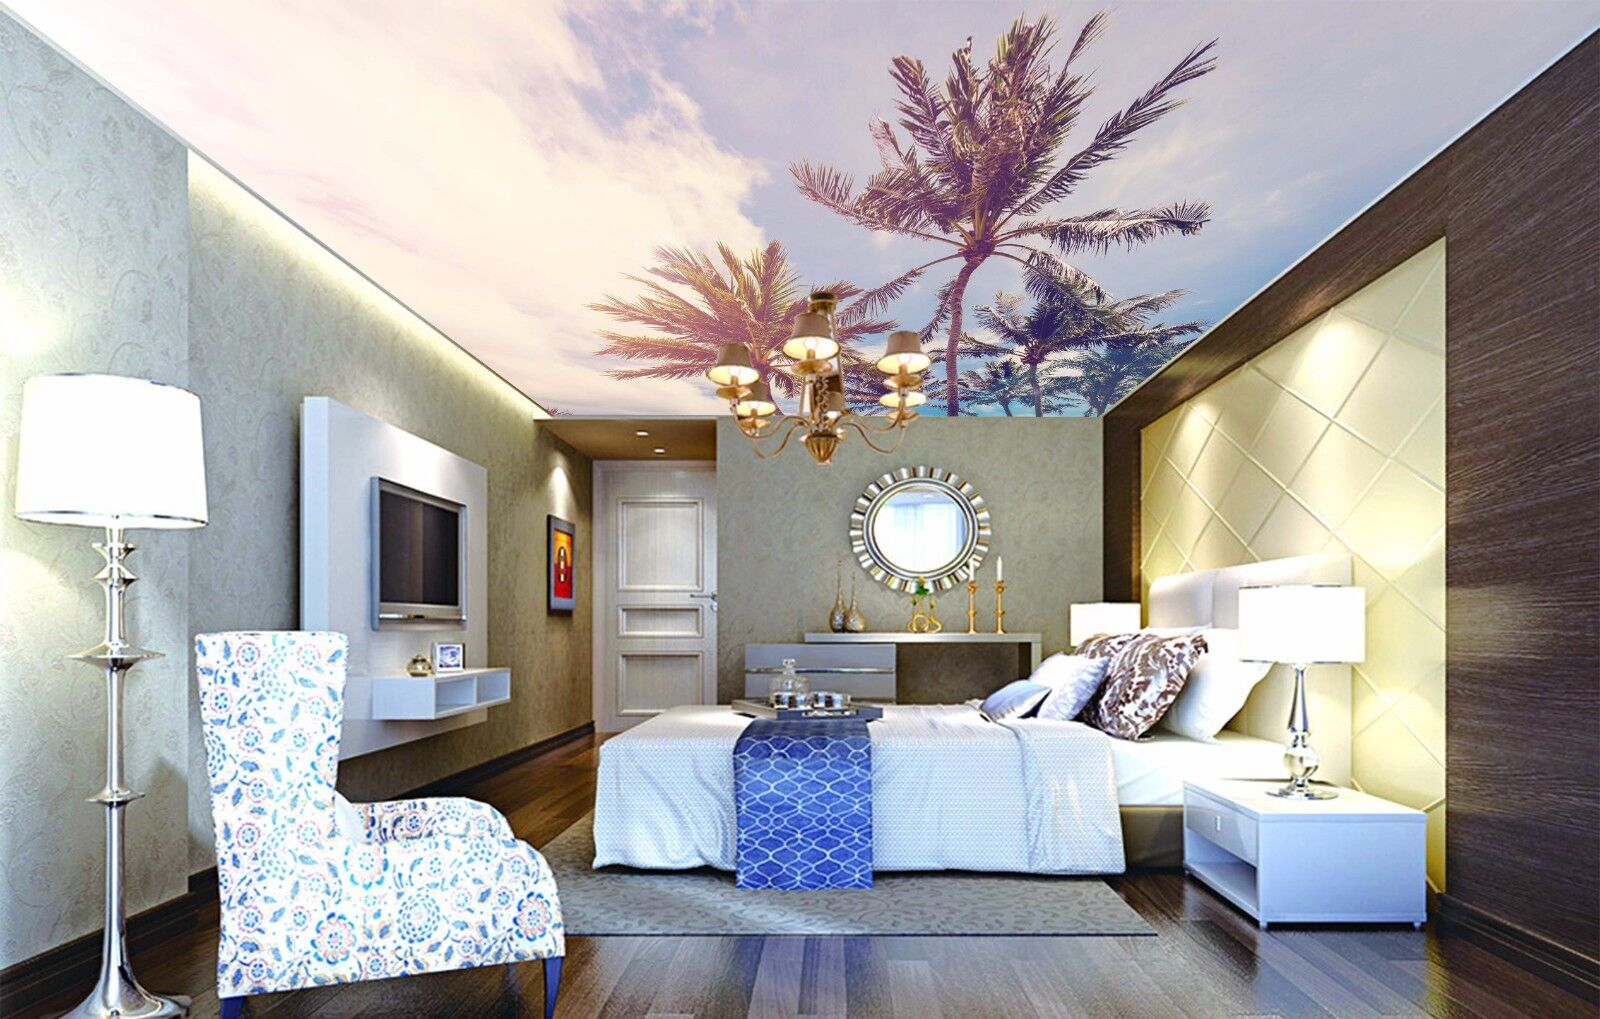 3D Clouds Trees 5 Ceiling WallPaper Murals Wall Print Decal Deco AJ WALLPAPER UK